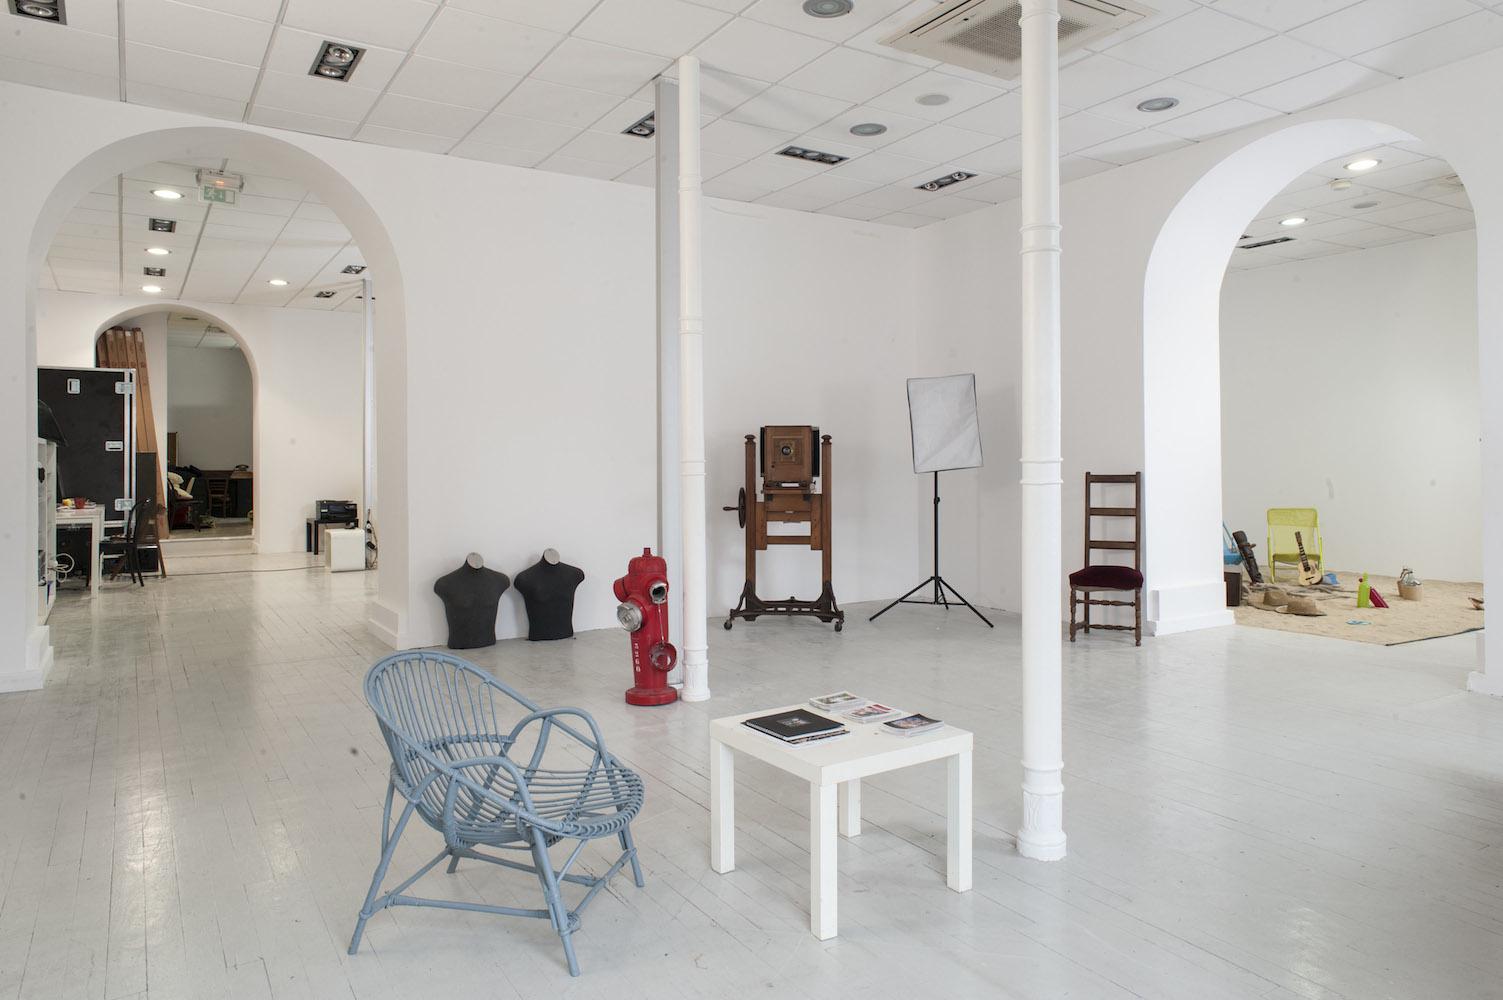 location, studio photo, lyon, photographe, location d'espace, location de salle, location d'espace pour Evenement d'entreprise, location d'espace pour séminaire d'entreprise, location de studio photo à Lyon